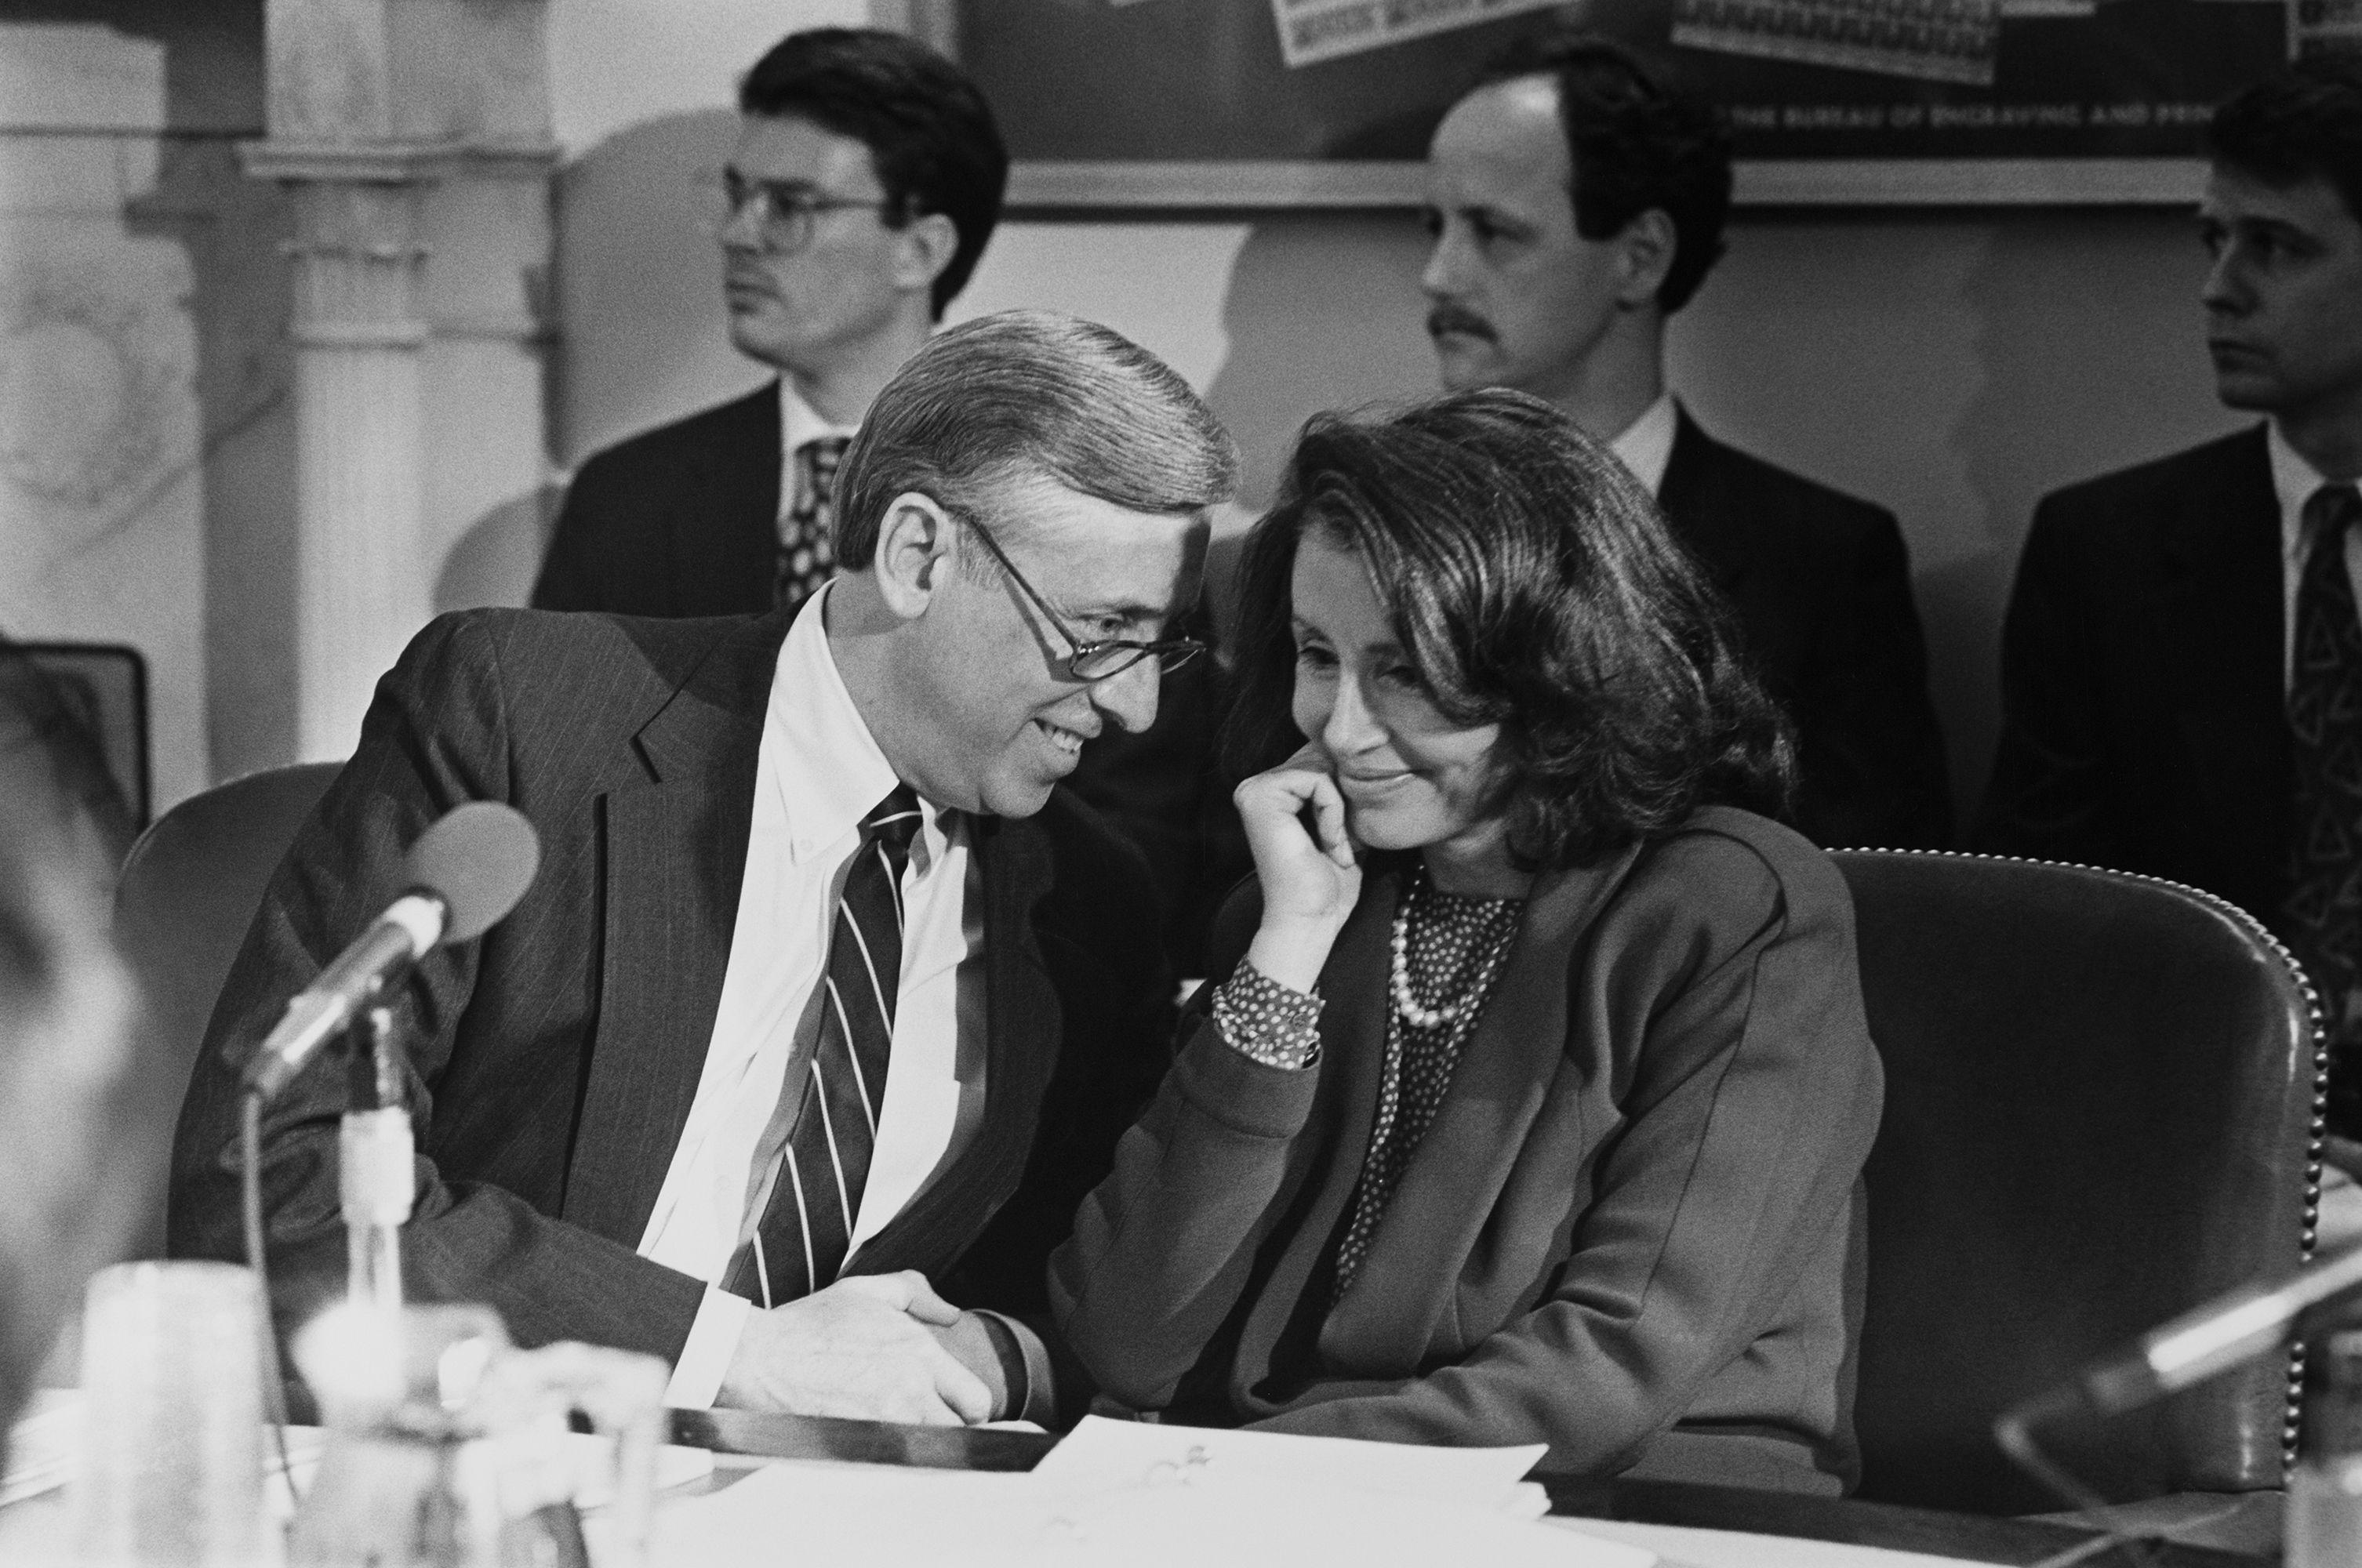 Representative Steny Hoyer and Pelosi chat.